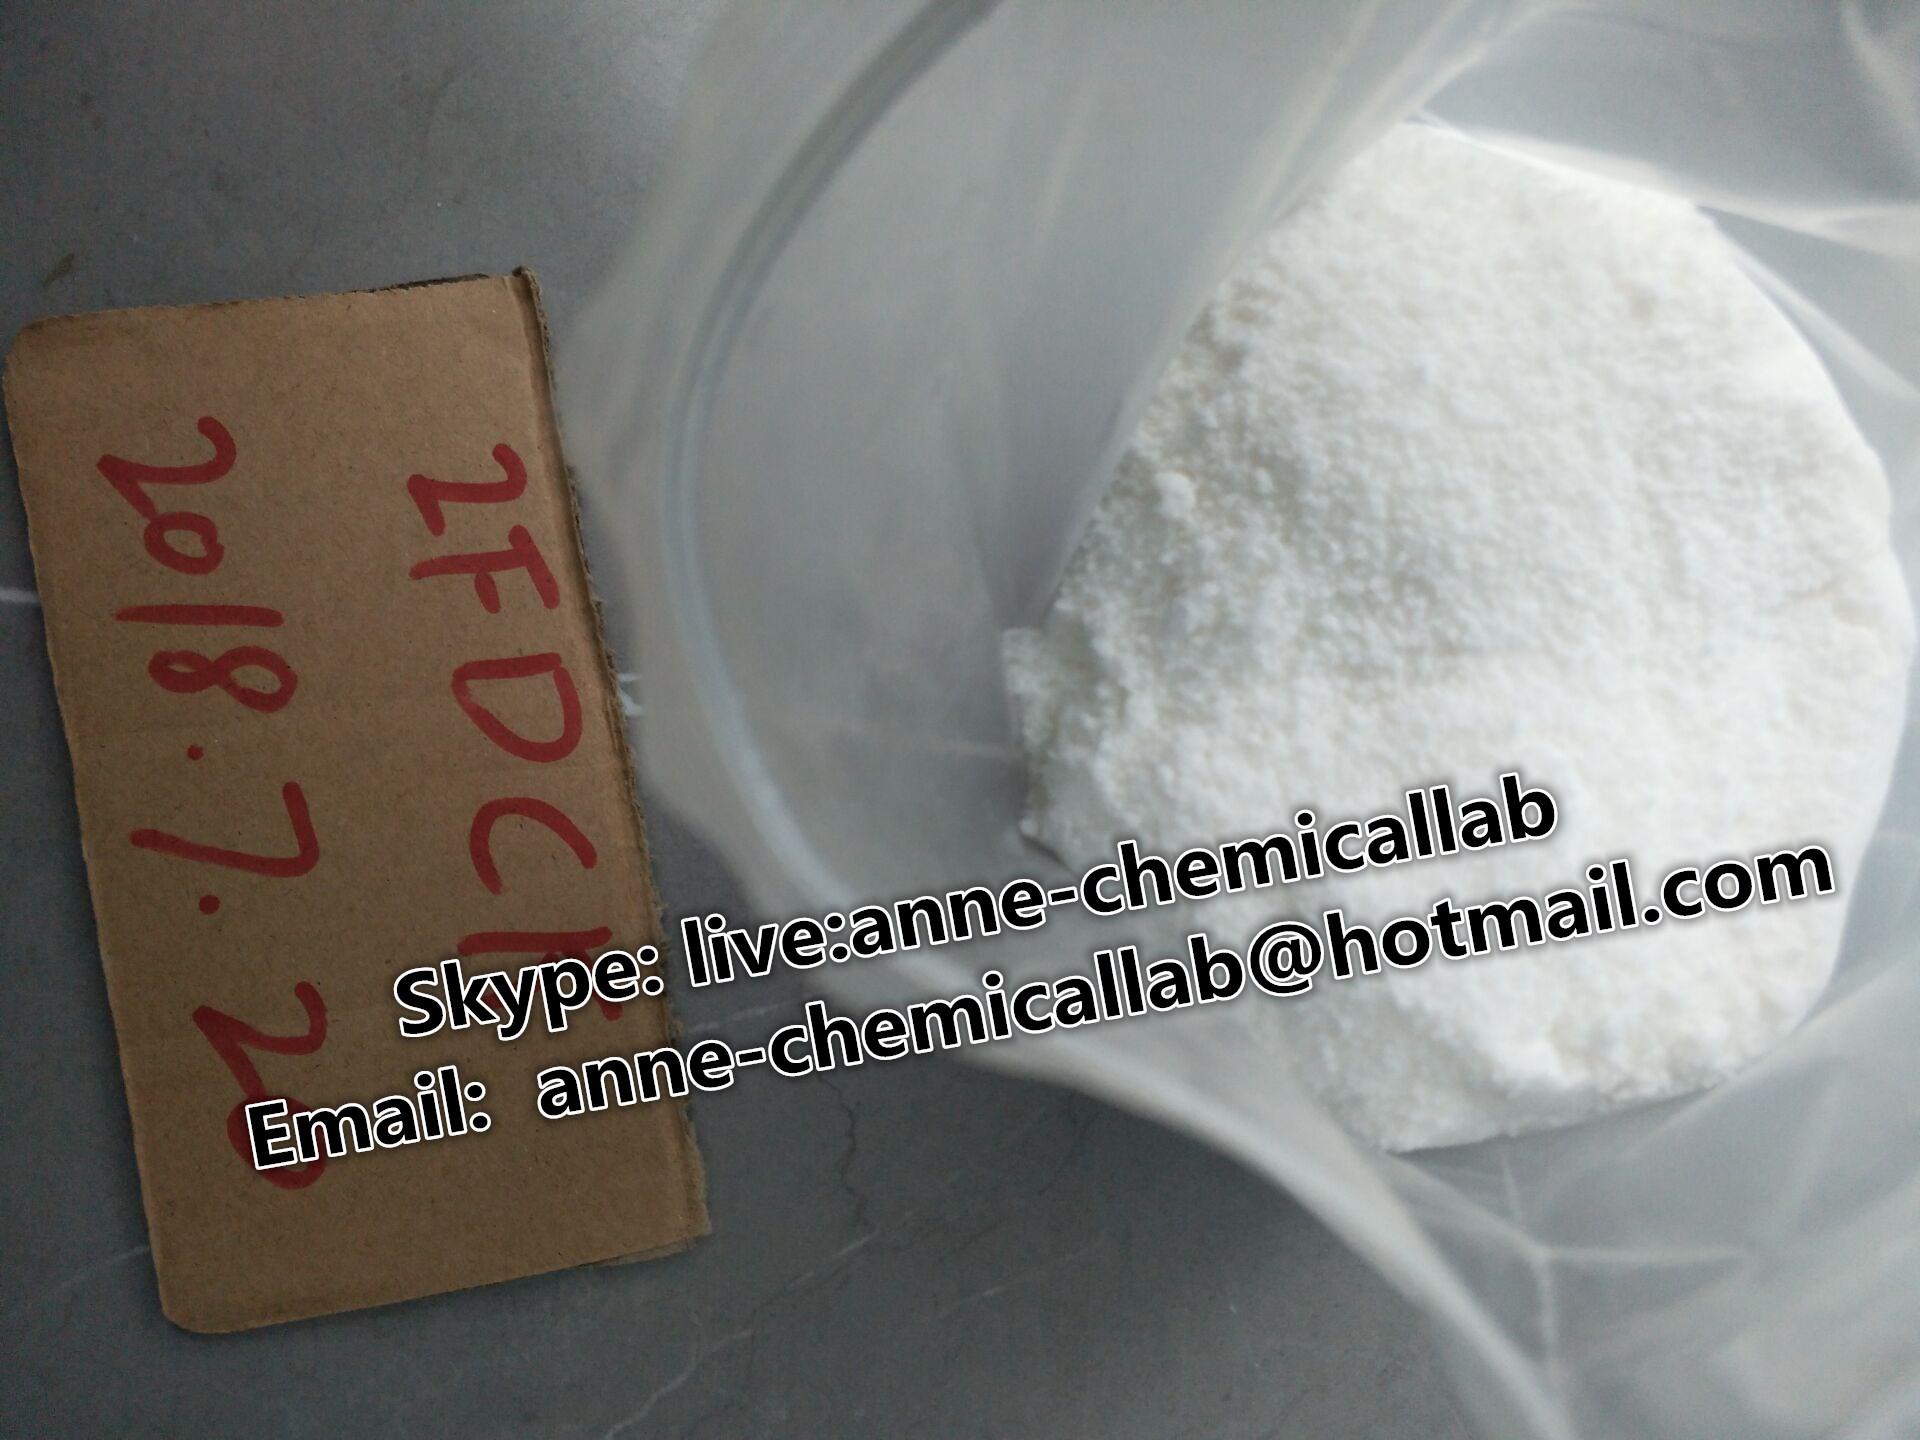 2fdck 2-FDCK Fluoroketamine 5FADB adbf 2-Fluorodeschloroketamine CAS No.111982-50-4 Skype: live:anne-chemicallab